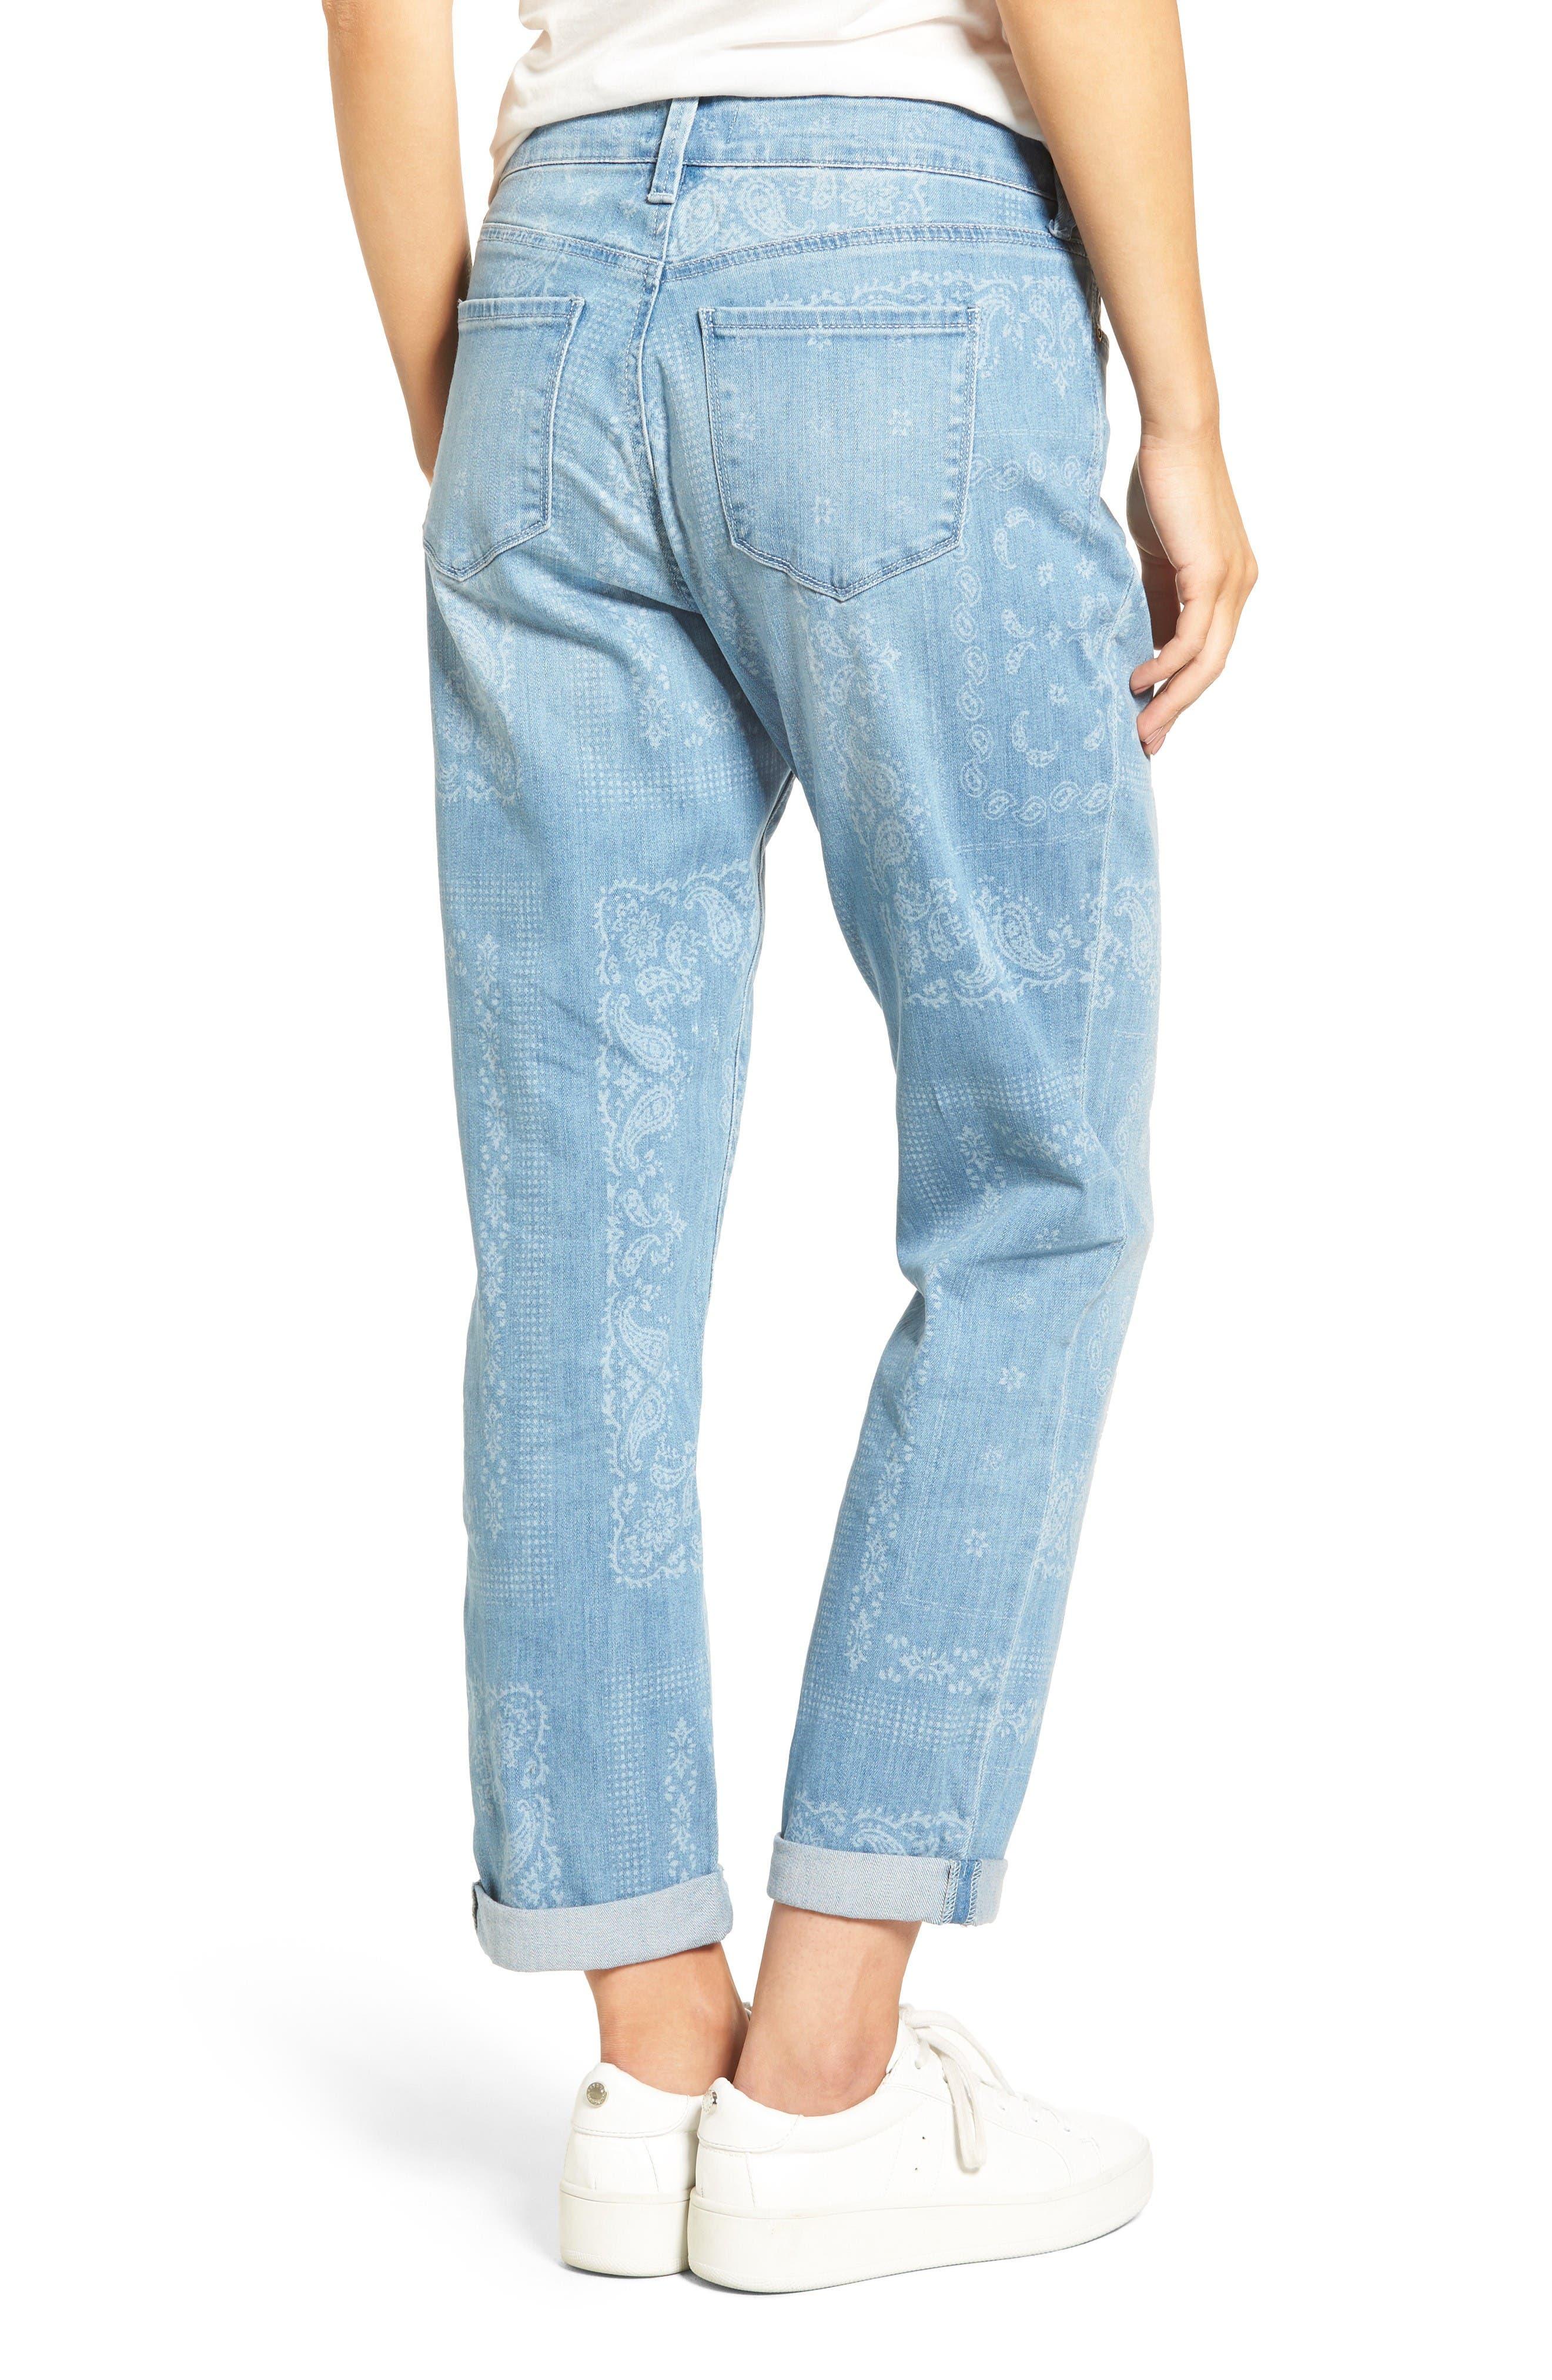 Alternate Image 2  - NYDJ Jessica Print Relaxed Boyfriend Jeans (Bandana) (Regular & Petite)